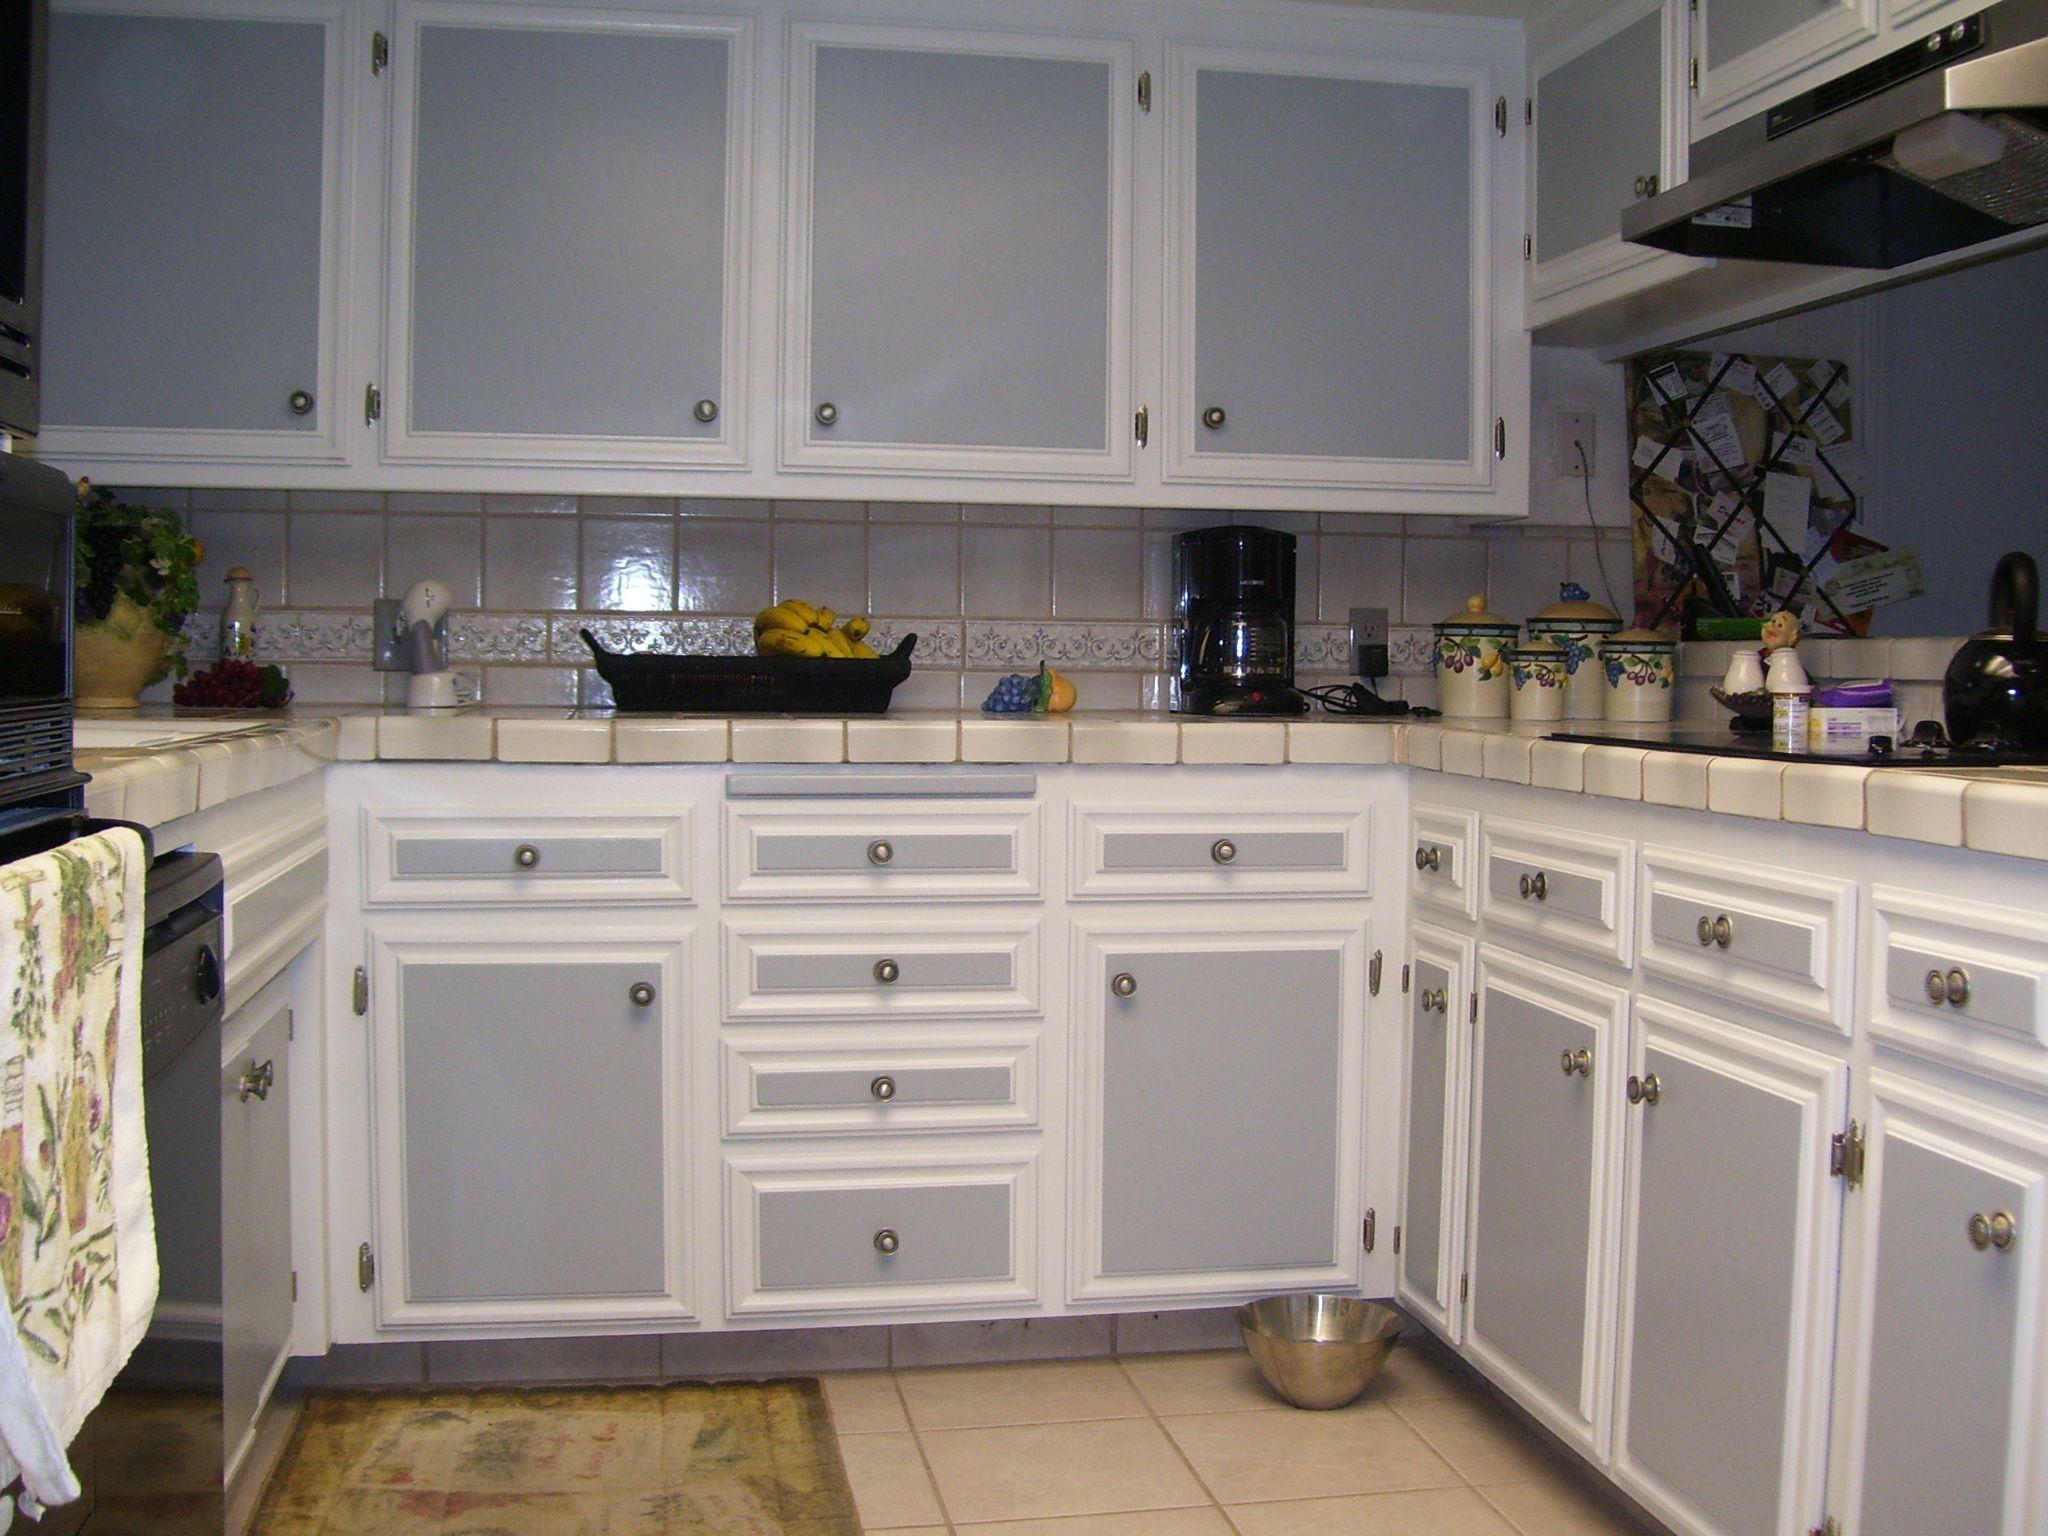 Best Kitchen Gallery: Painted Cabi S Brandom Painting Frank Brandom Painting of Two Toned Kitchen Cabinet Doors on cal-ite.com